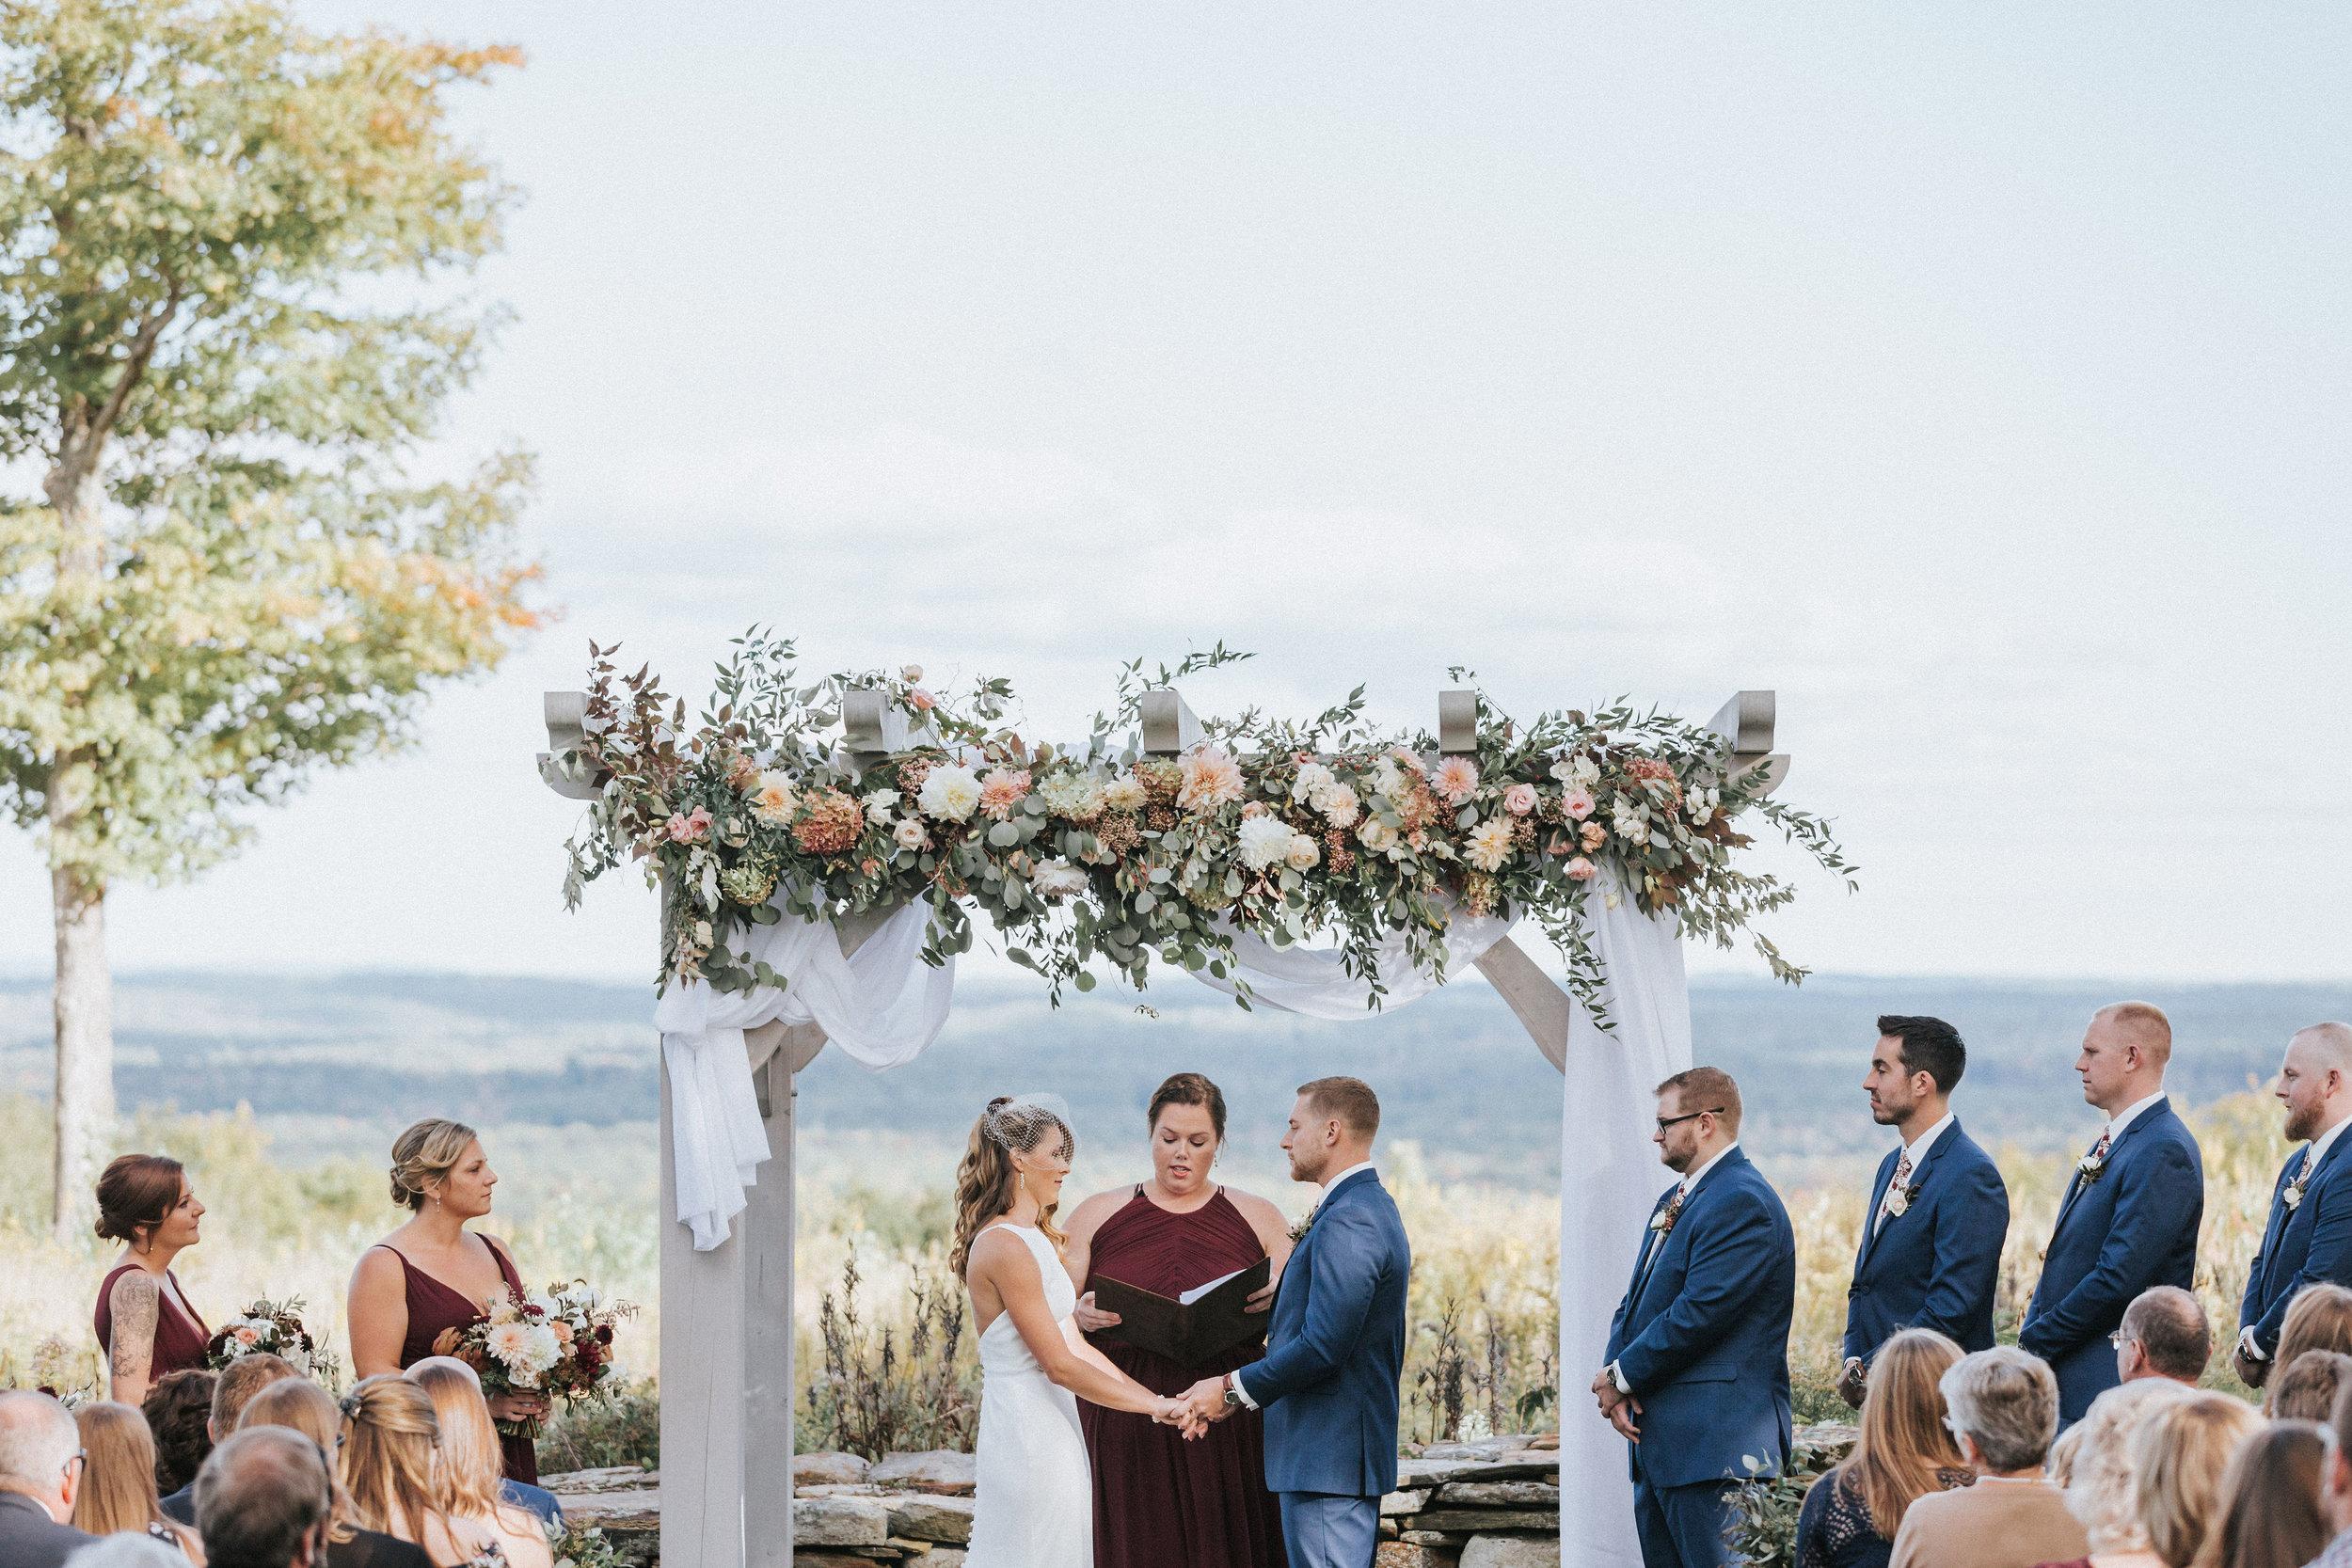 Allie_Greg_Beech_Hill_Barn_Wedding_Ceremony-149.jpg